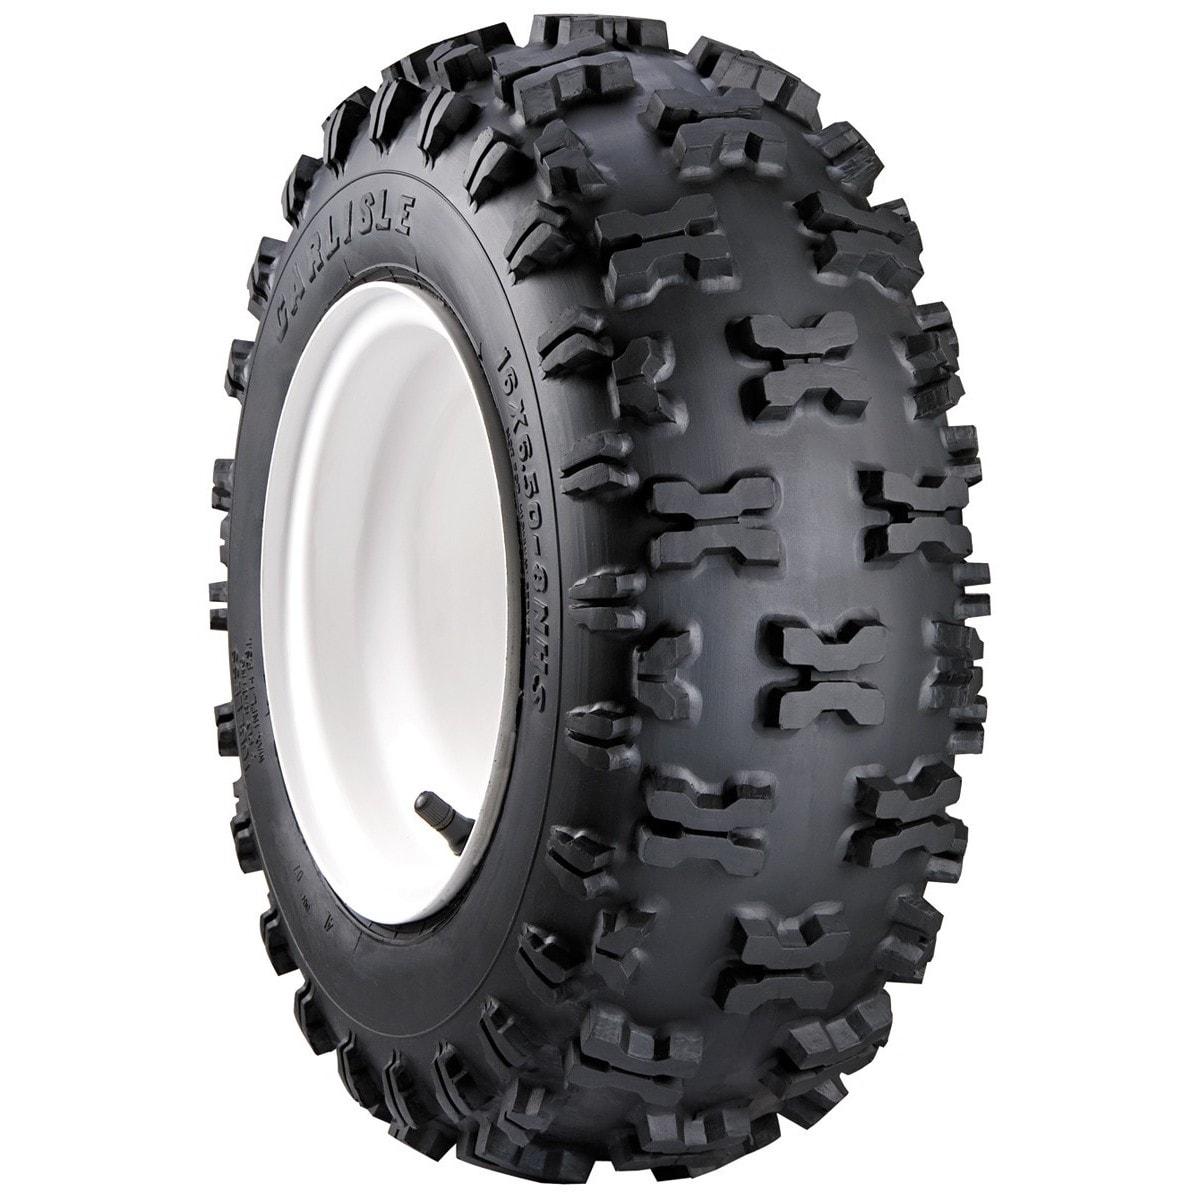 Carlisle Snow Hog Snow Thrower Tire - 480-8 LRA/2 ply (Bl...